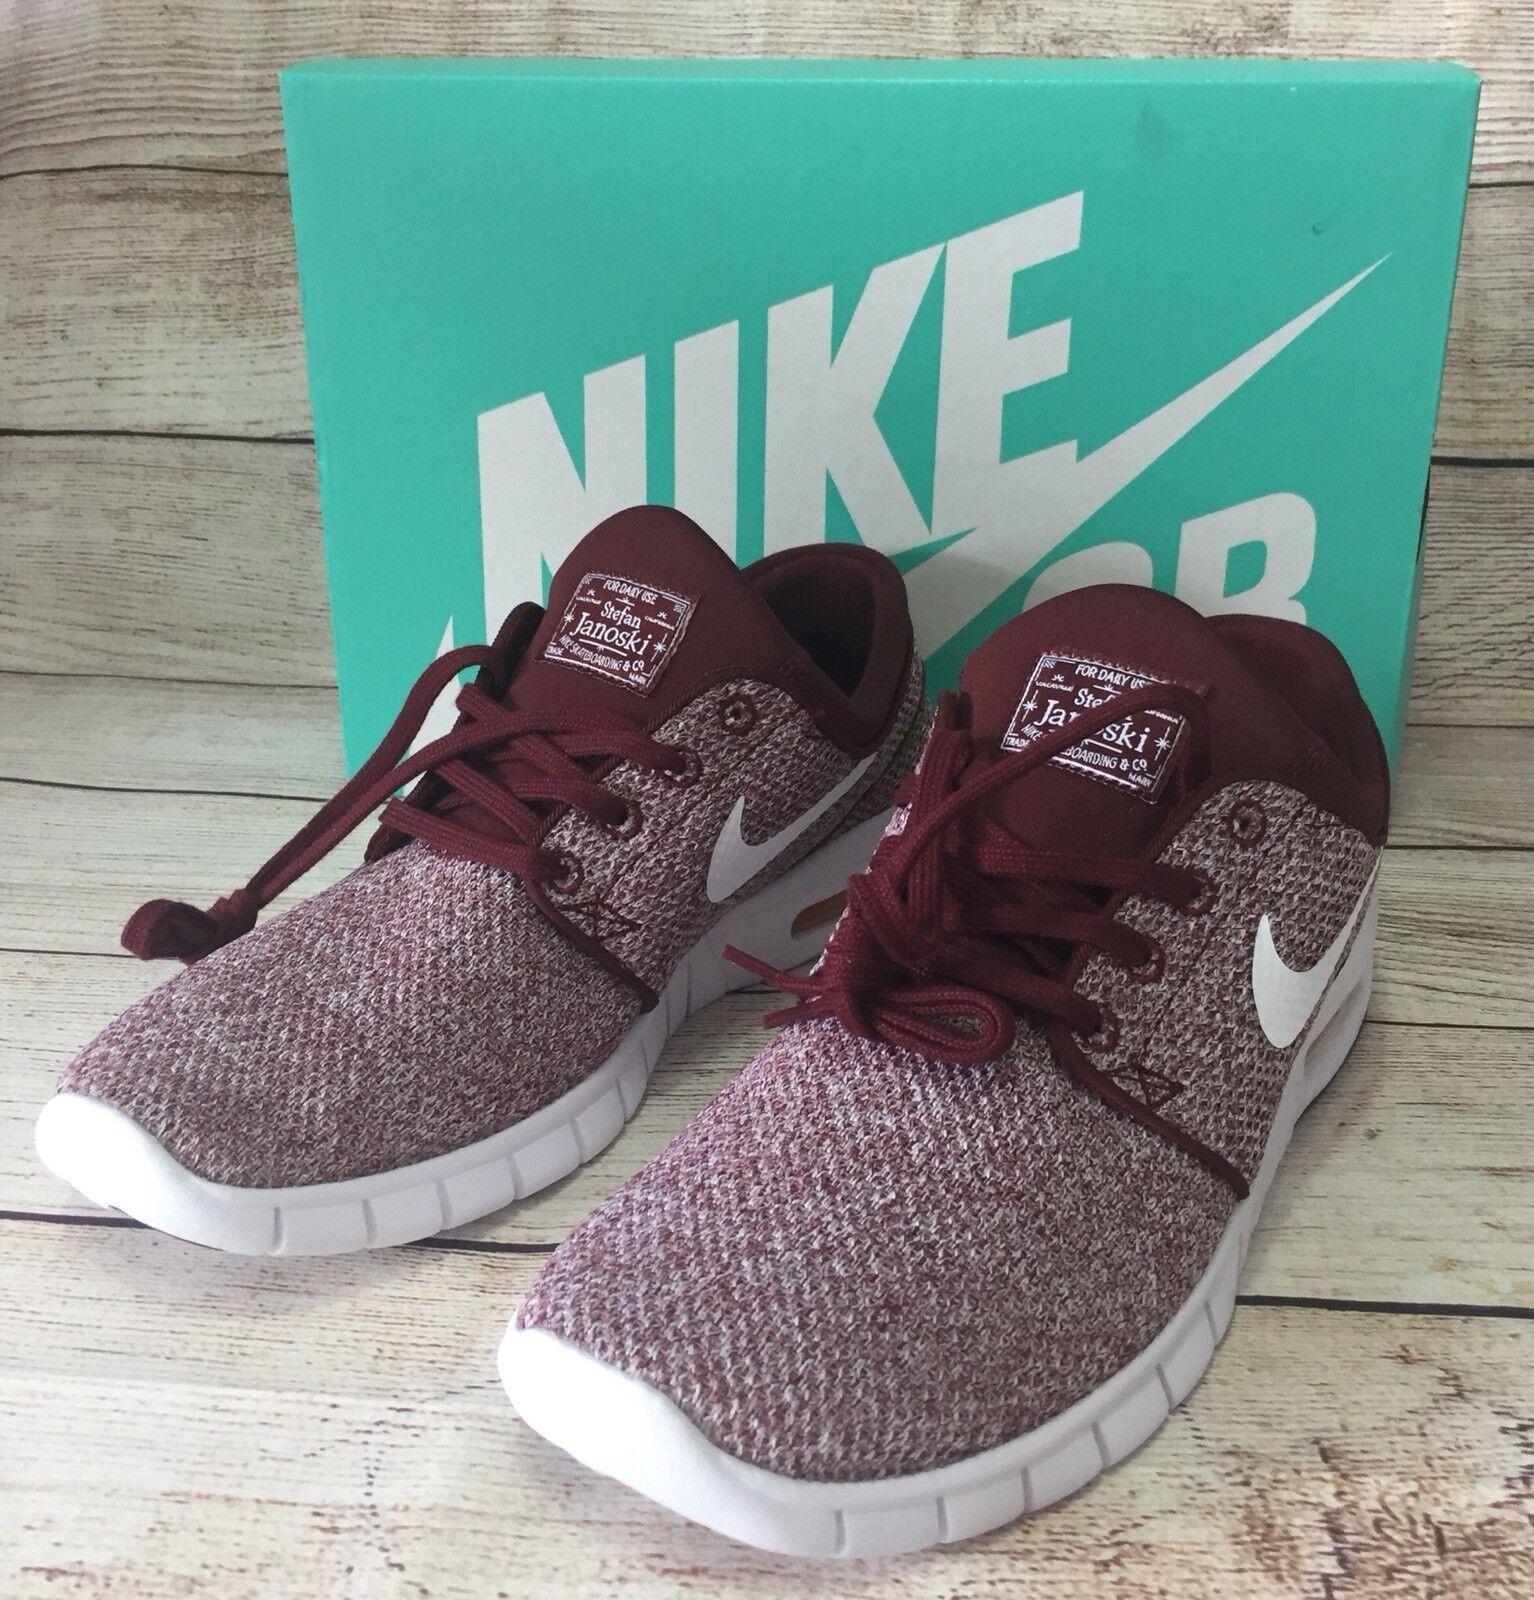 e531d53001c7f6 Nike SB Stefan Janoski Max Mens Size 10 Skateboarding Shoe Shoe Shoe  Burgundy 631303-618 b91318